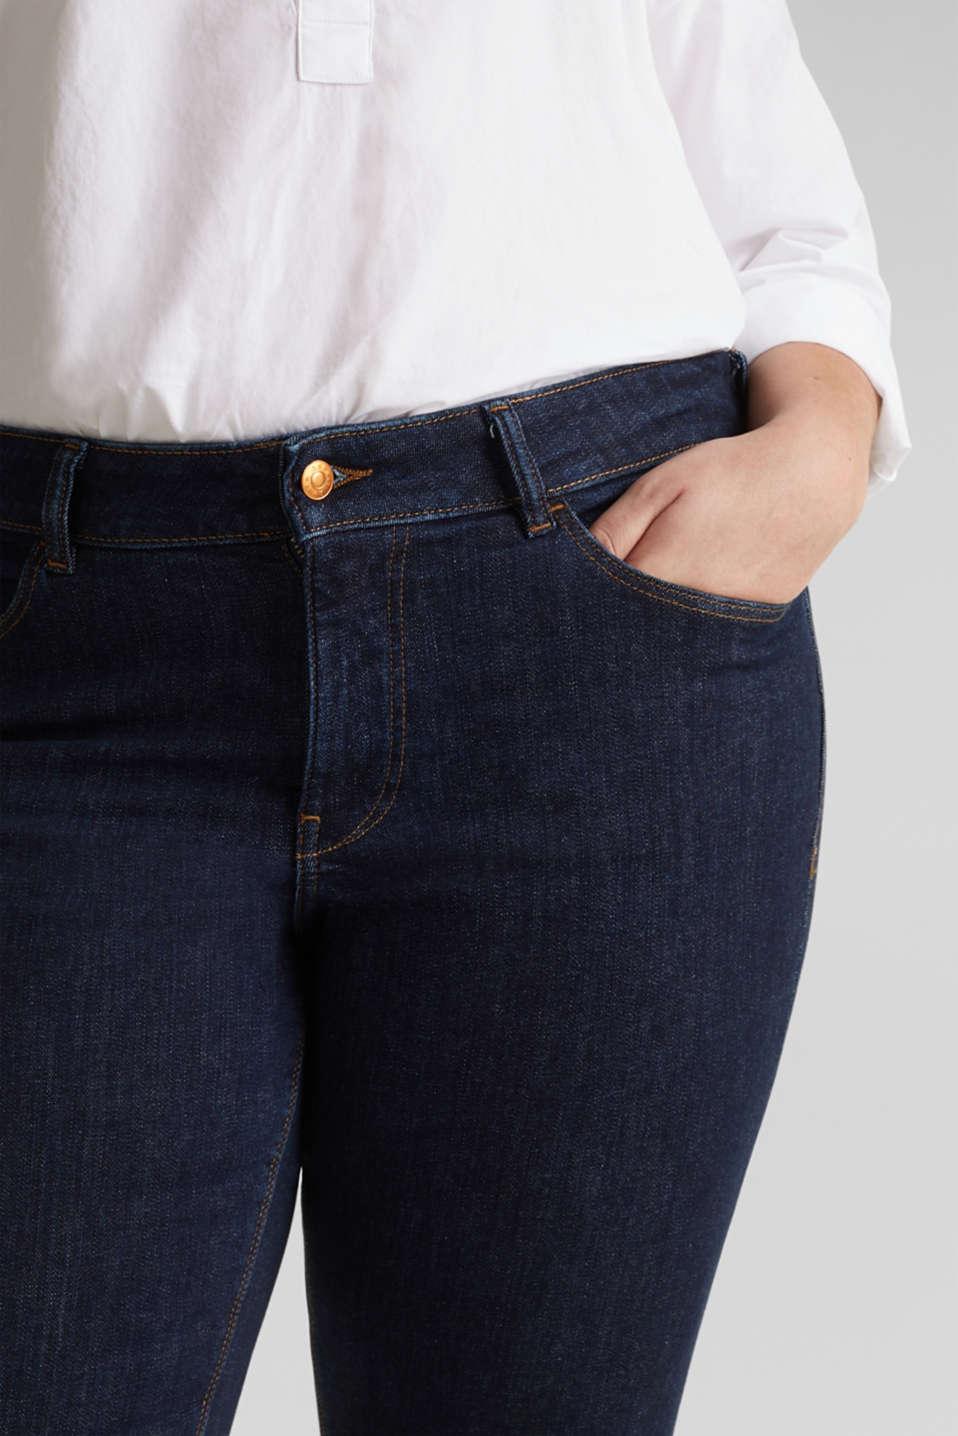 CURVY Basic-Jeans mit Stretchkomfort, BLUE RINSE, detail image number 2